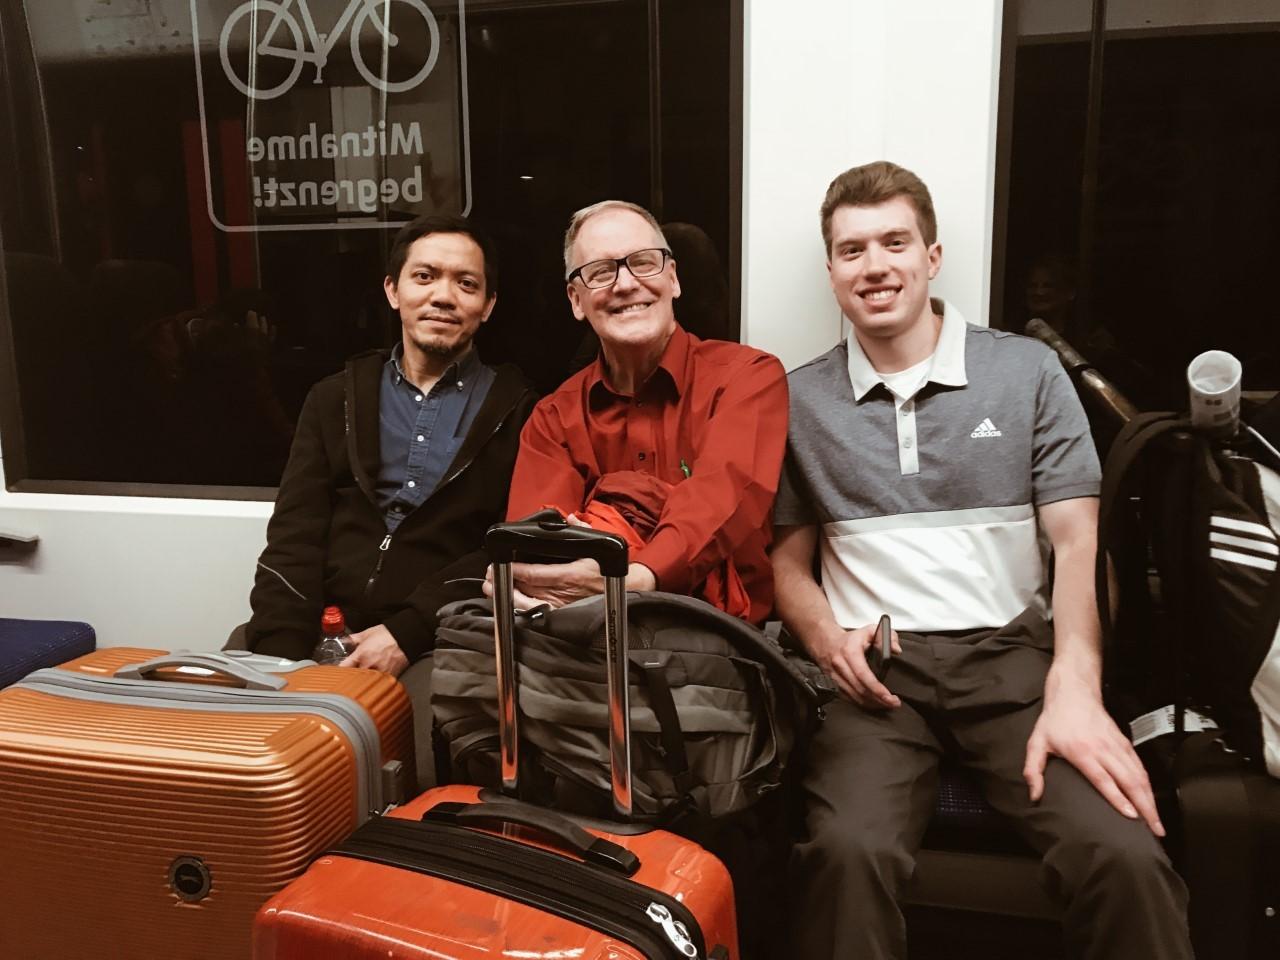 Happy Train Travelers featuring Dr. Smith, Dr. Jaafar, and Ryan Malatesta (Rye Bread)